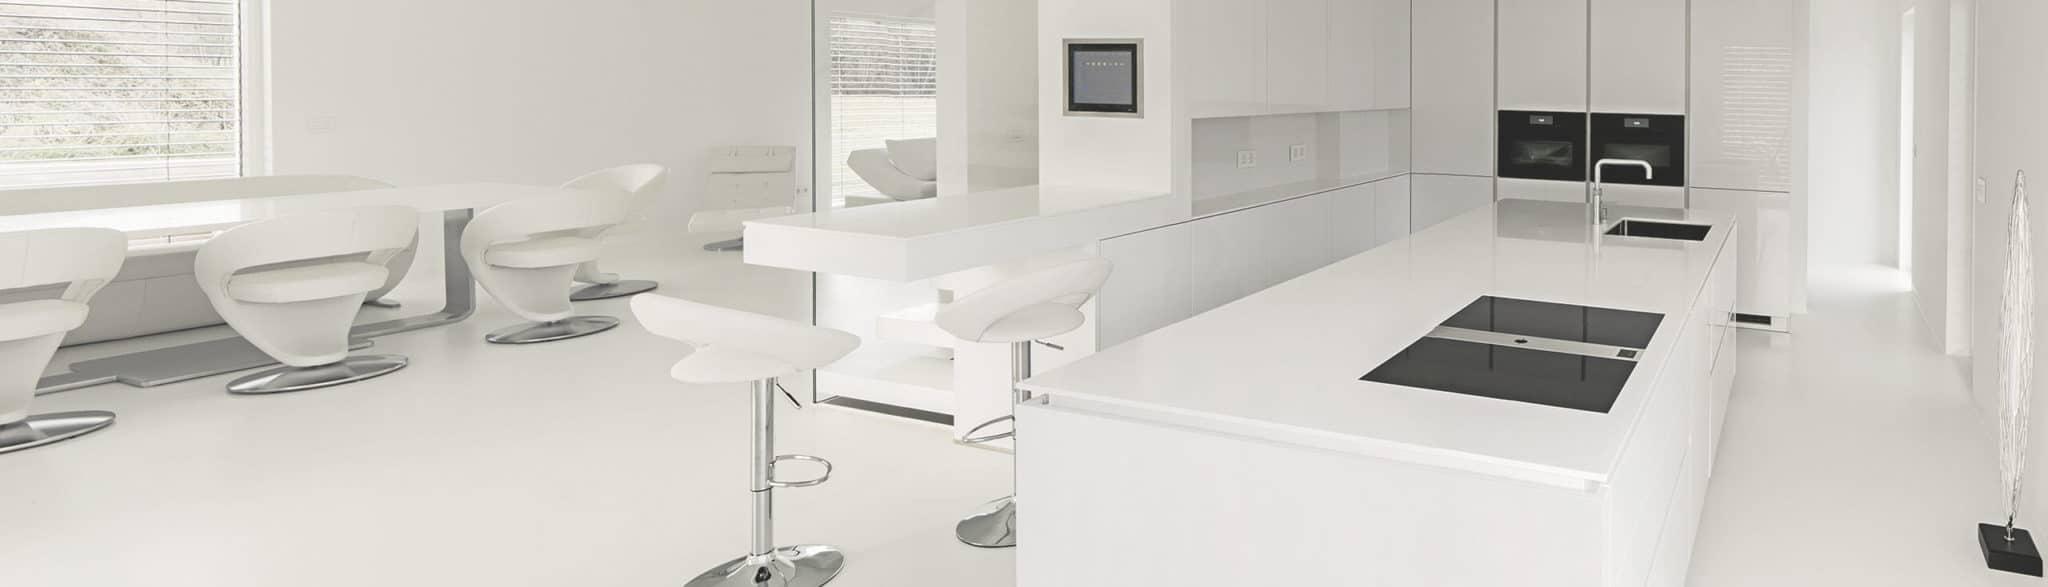 Cocina de dise o blanca muebles de cocina en madrid for Diseno de cocina online